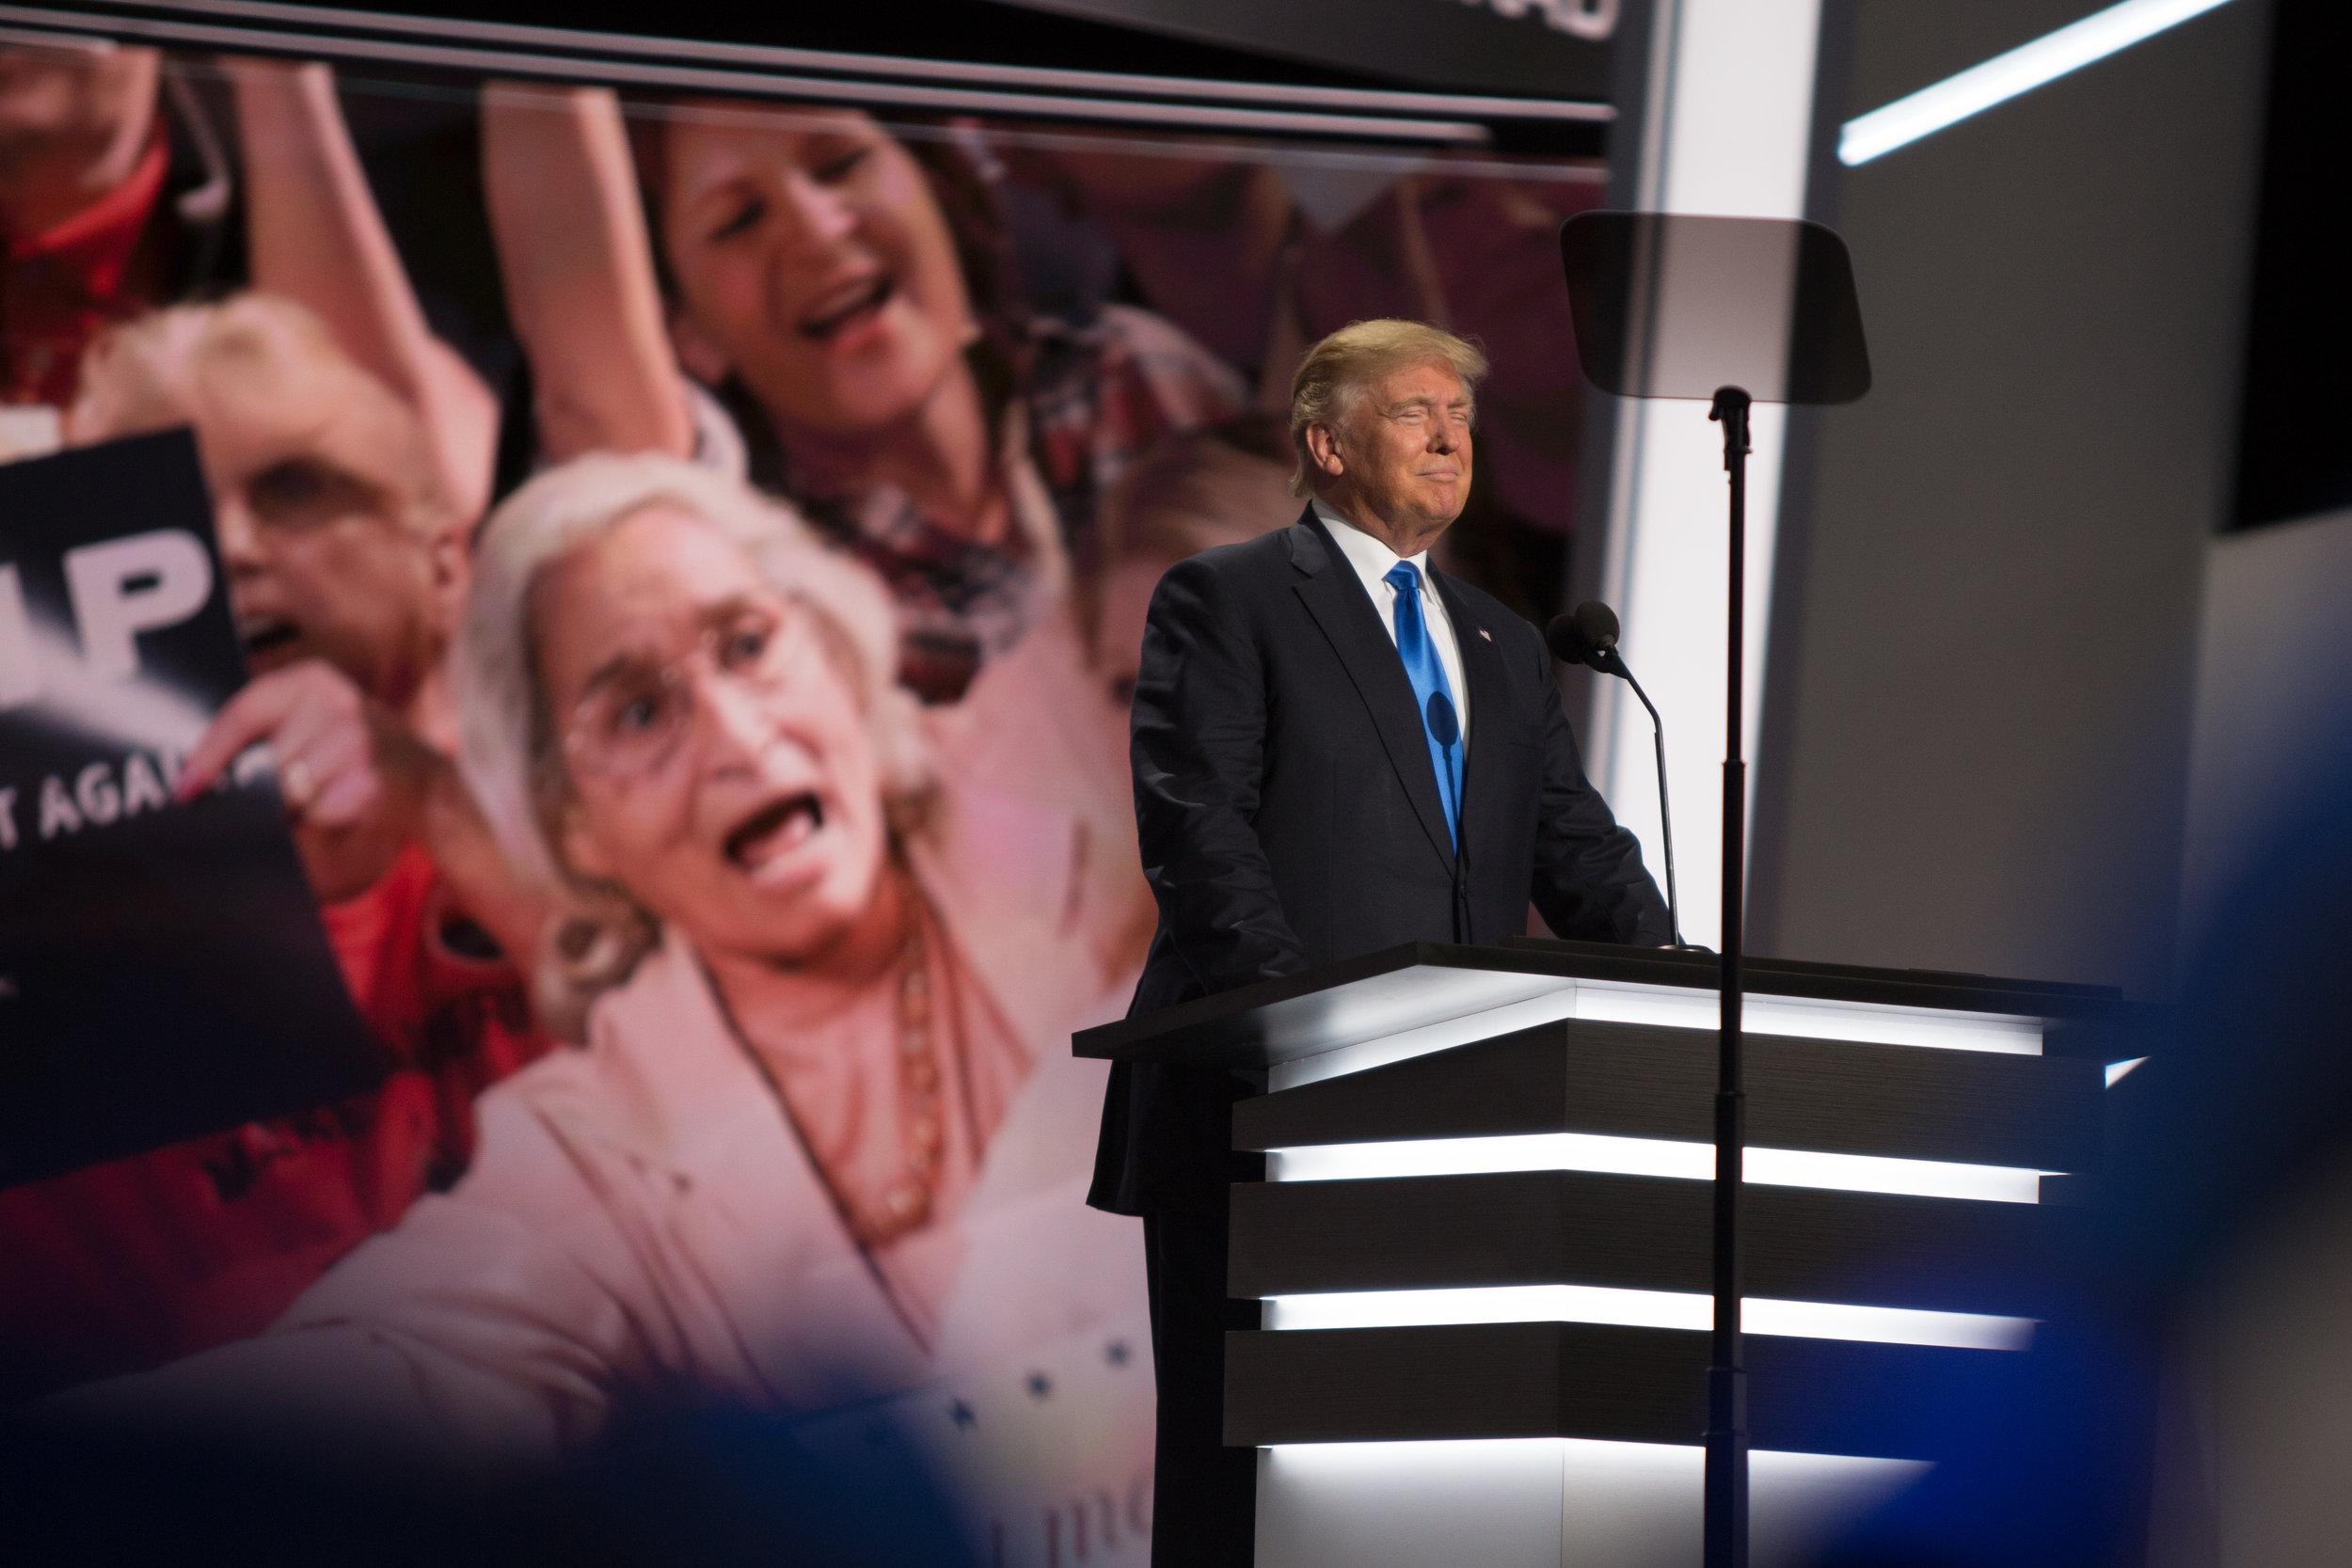 Donald J. Trump Addresses The RNC